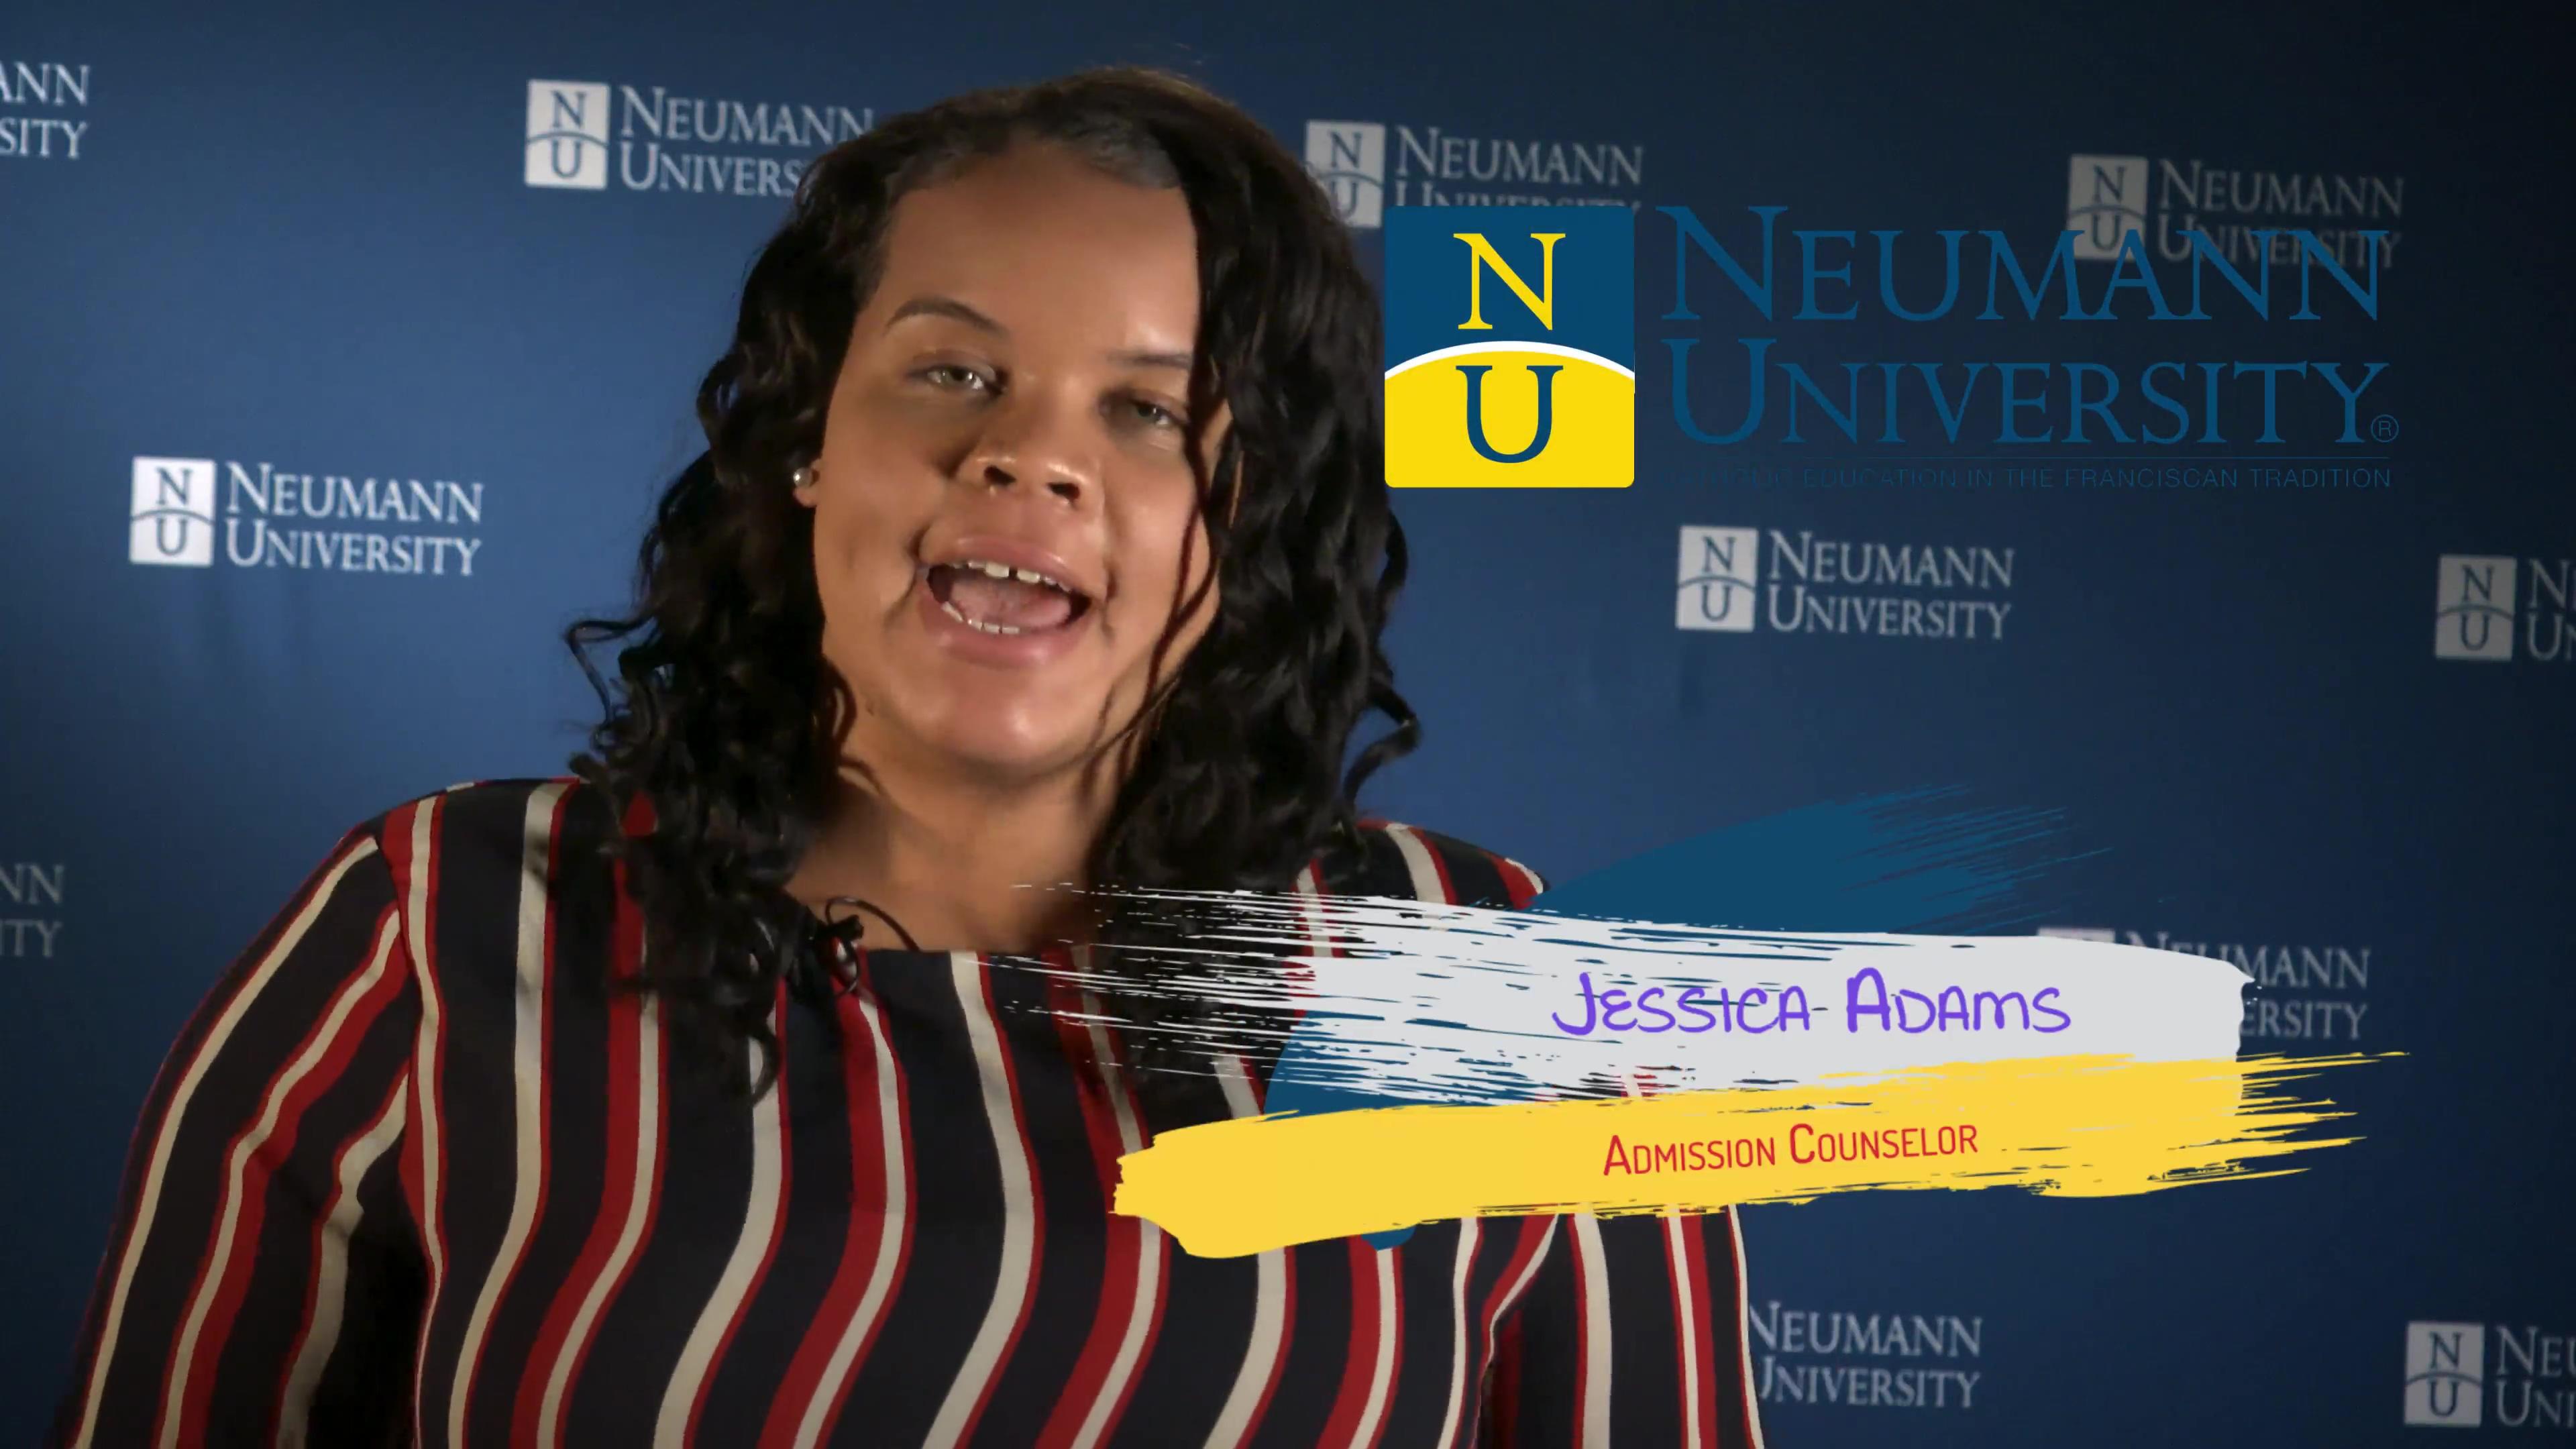 Neumann University - Admission Counselor Jessica Adams